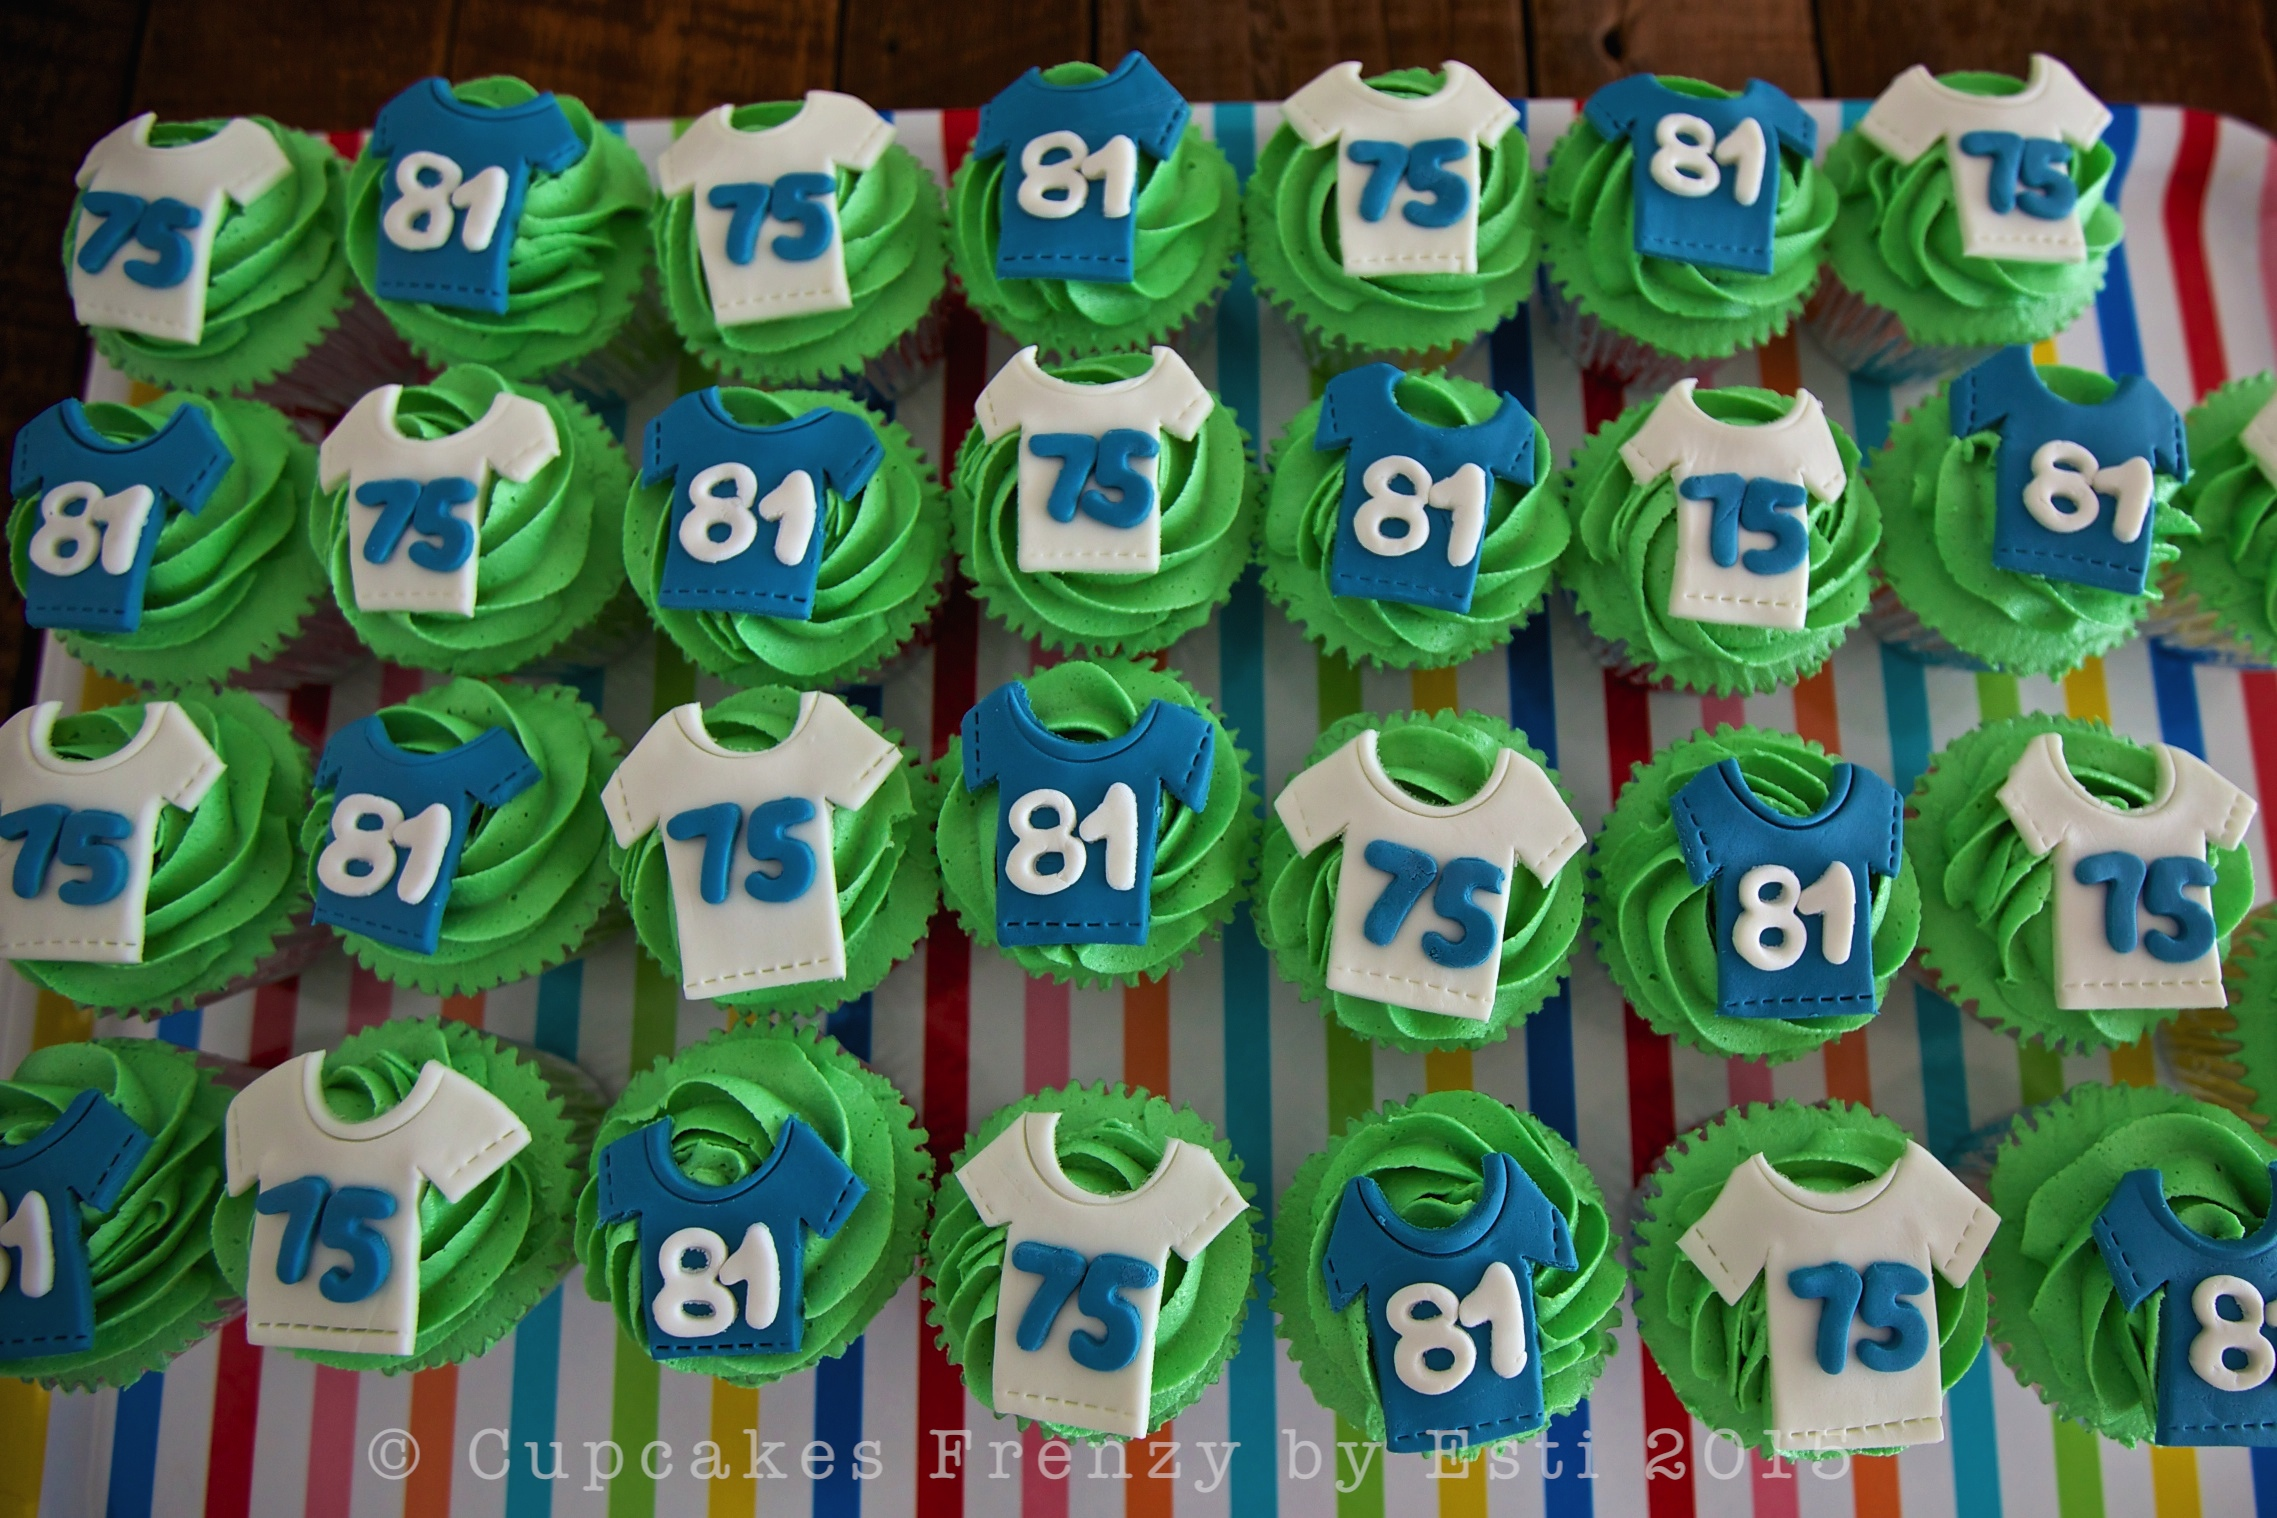 11 Team Jersey Pull Apart Cupcakes Photo Football Jersey Cupcake